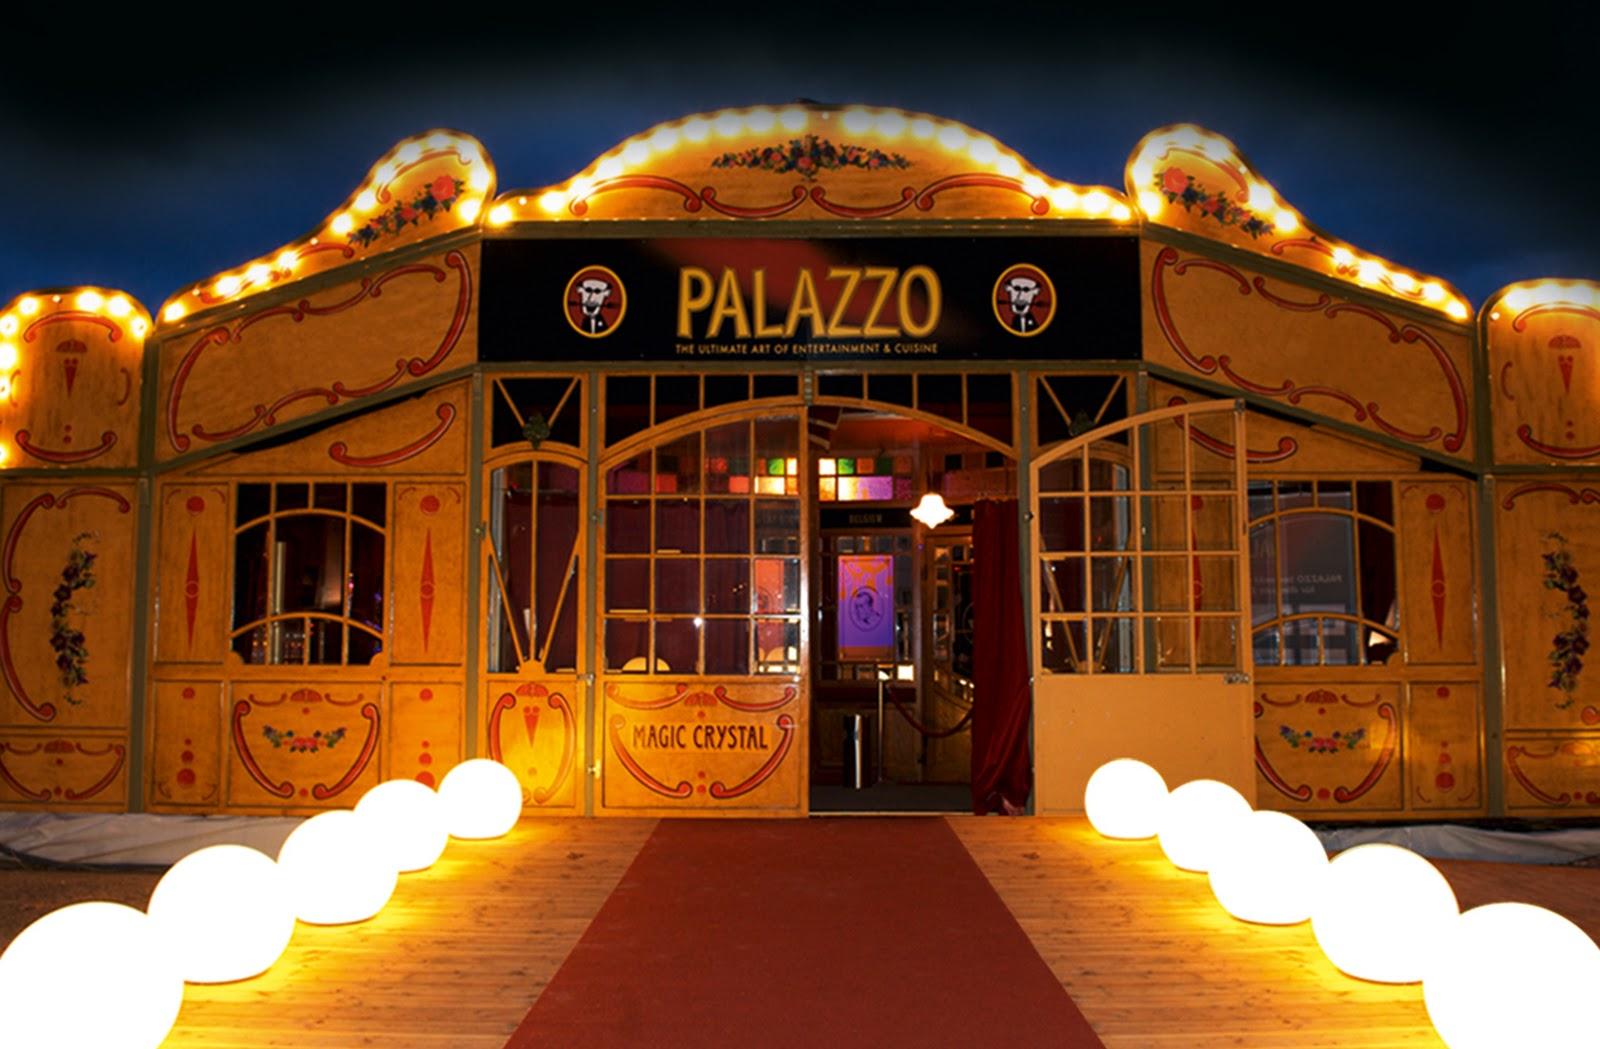 mag21 tipps palazzo gourmet theater kommt wieder nach stuttgart. Black Bedroom Furniture Sets. Home Design Ideas